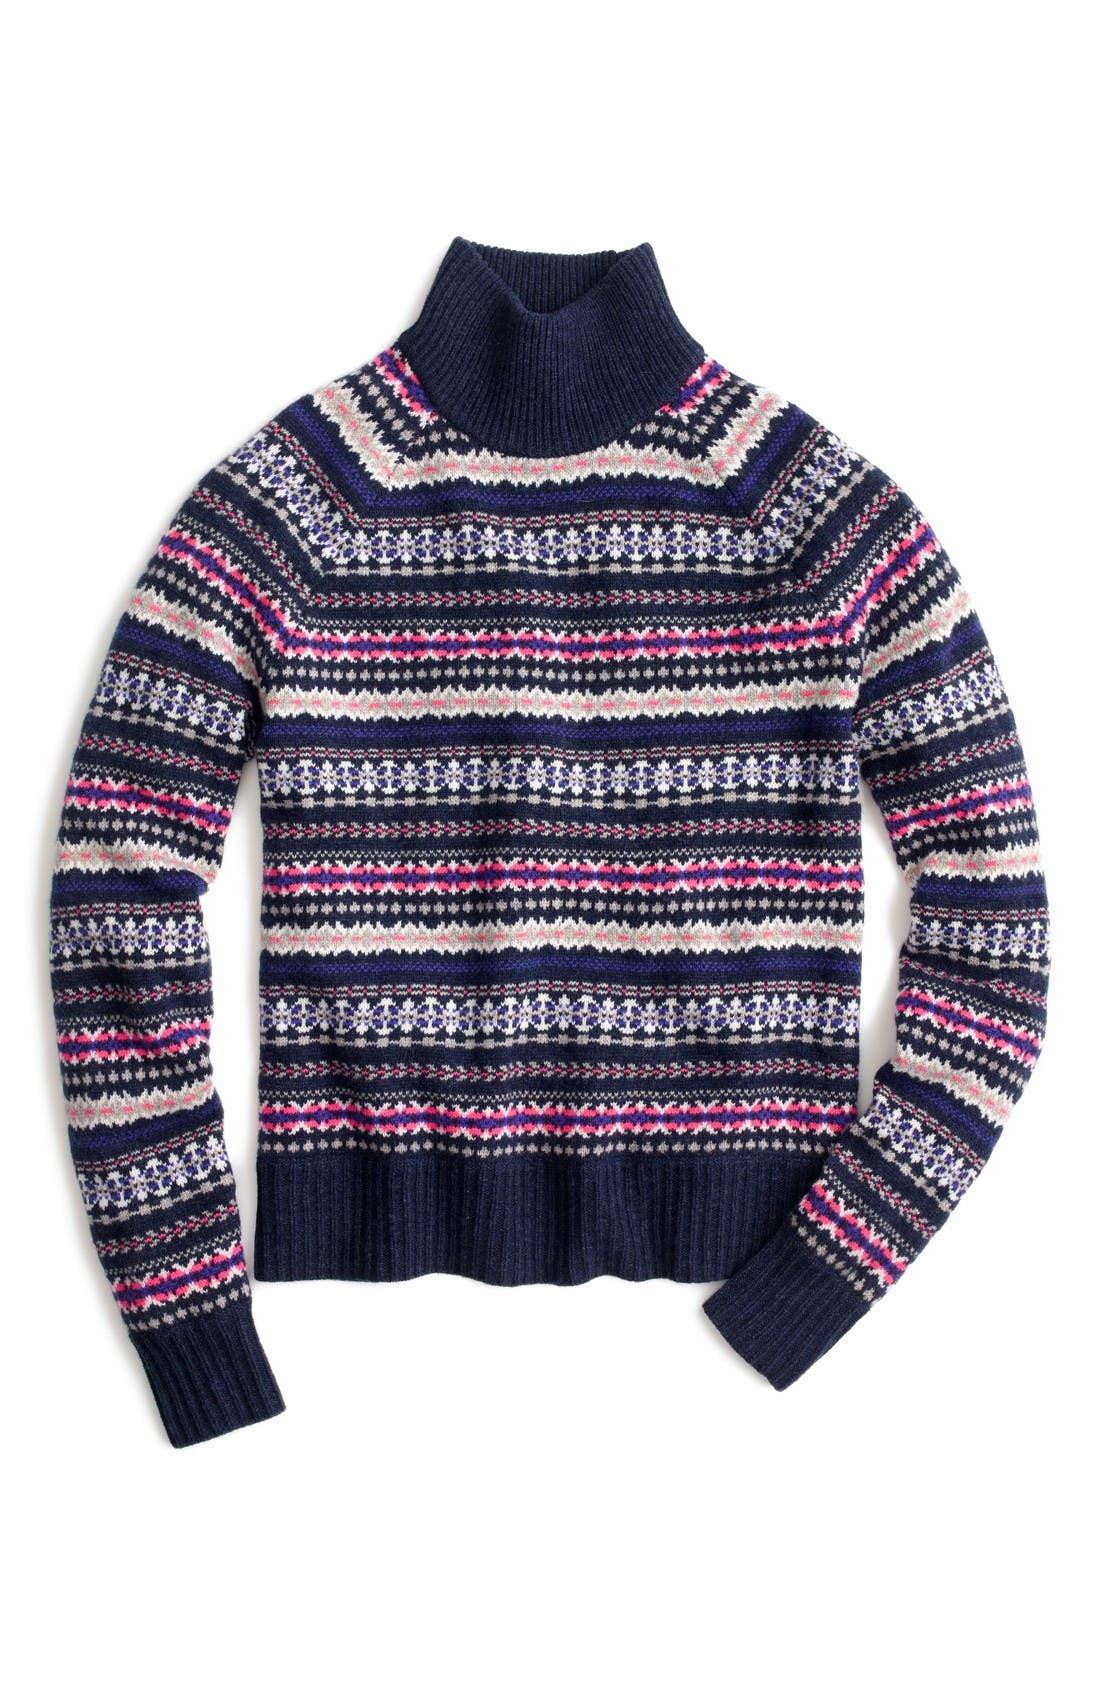 J.Crew Fair Isle Turtleneck Sweater | Nordstrom